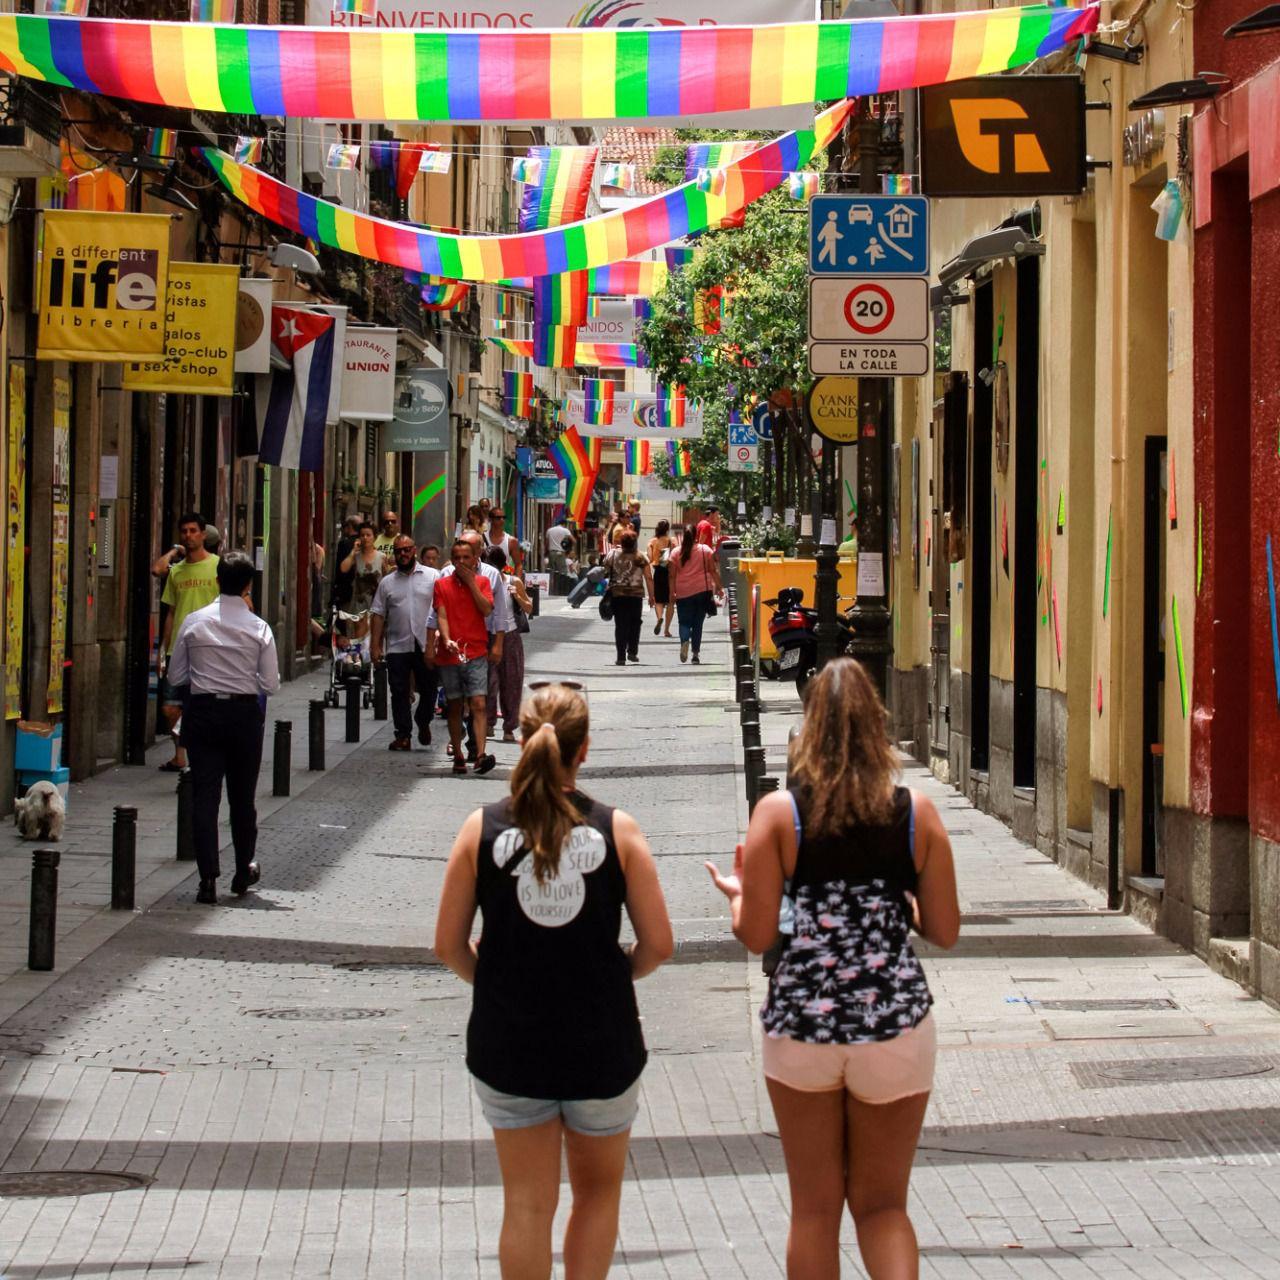 video parejas liberales arganzuela